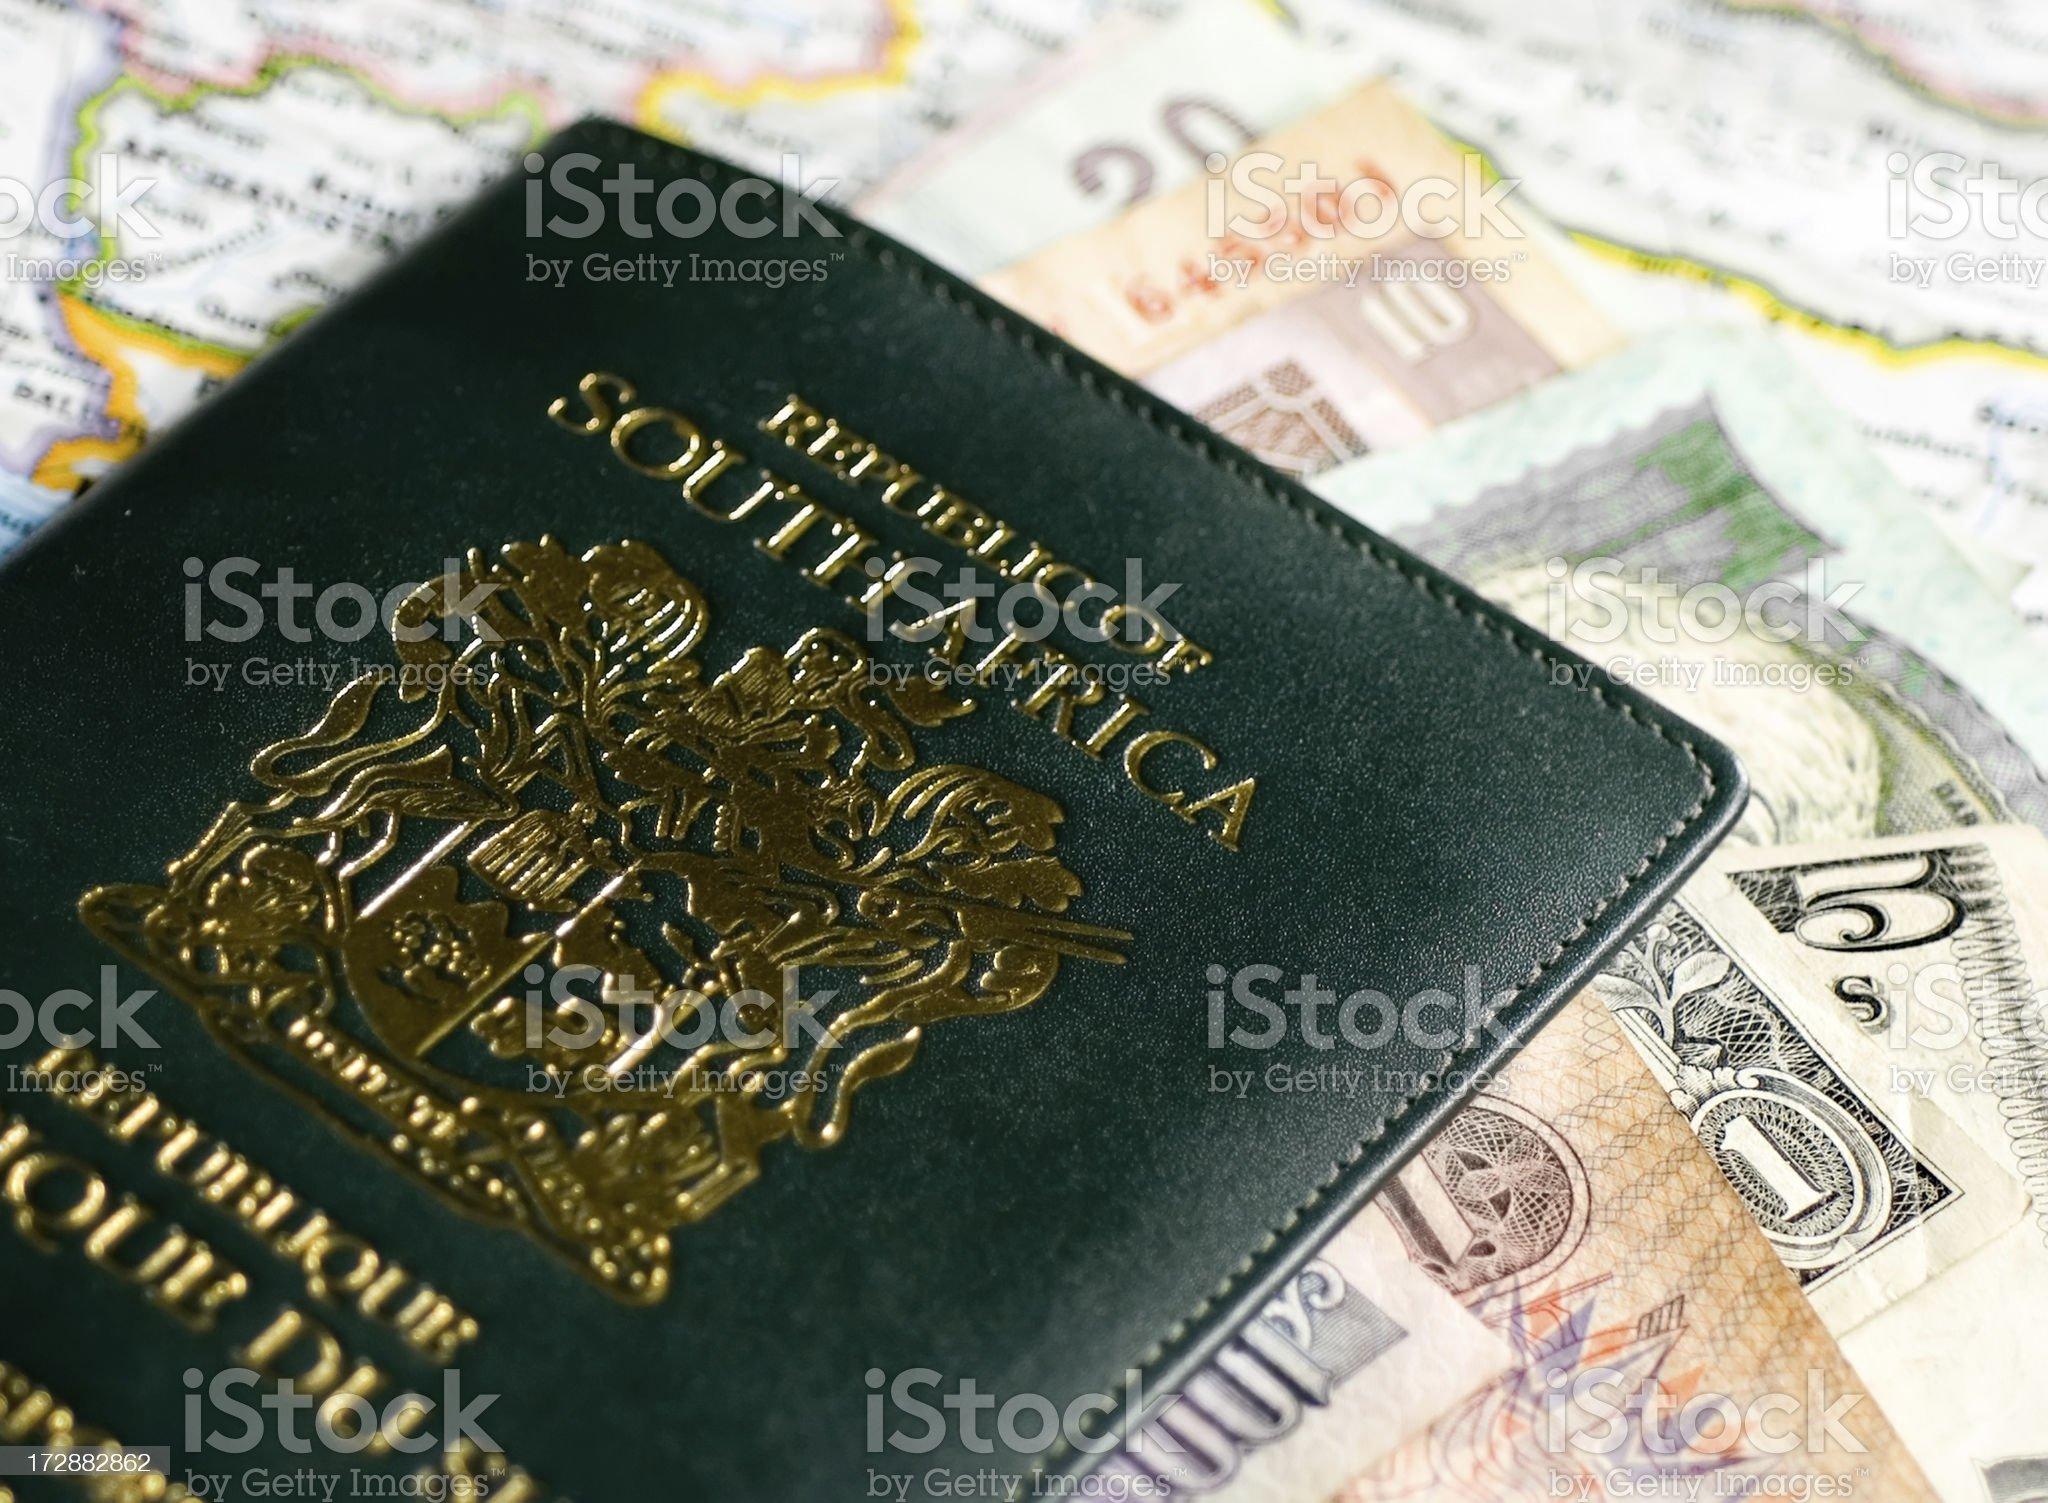 Travel around the world royalty-free stock photo